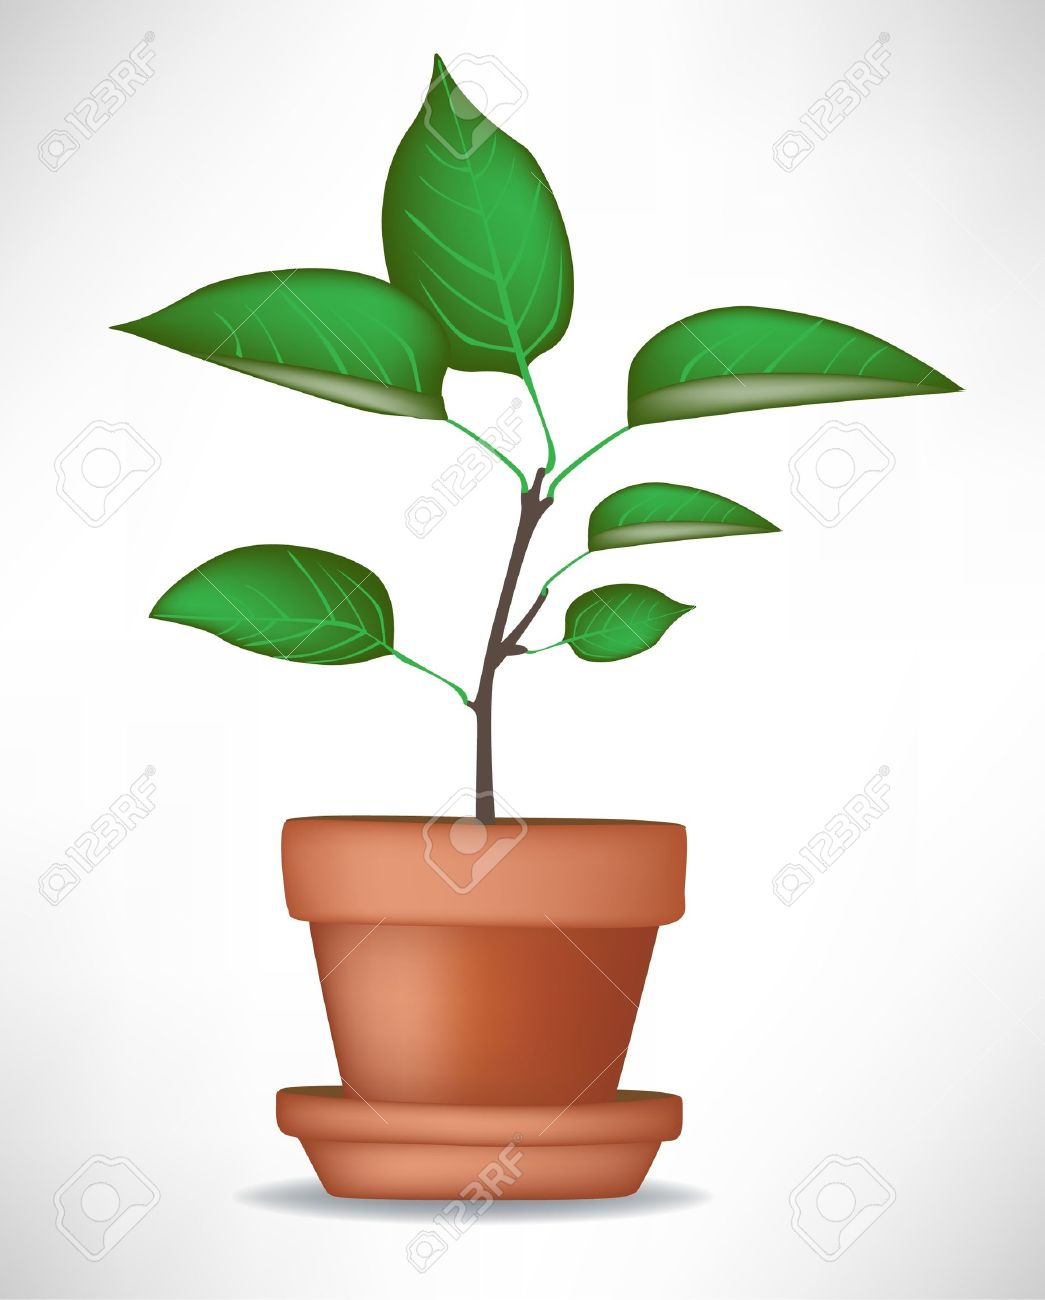 1045x1300 Pot Plant Clipart Tree Growing